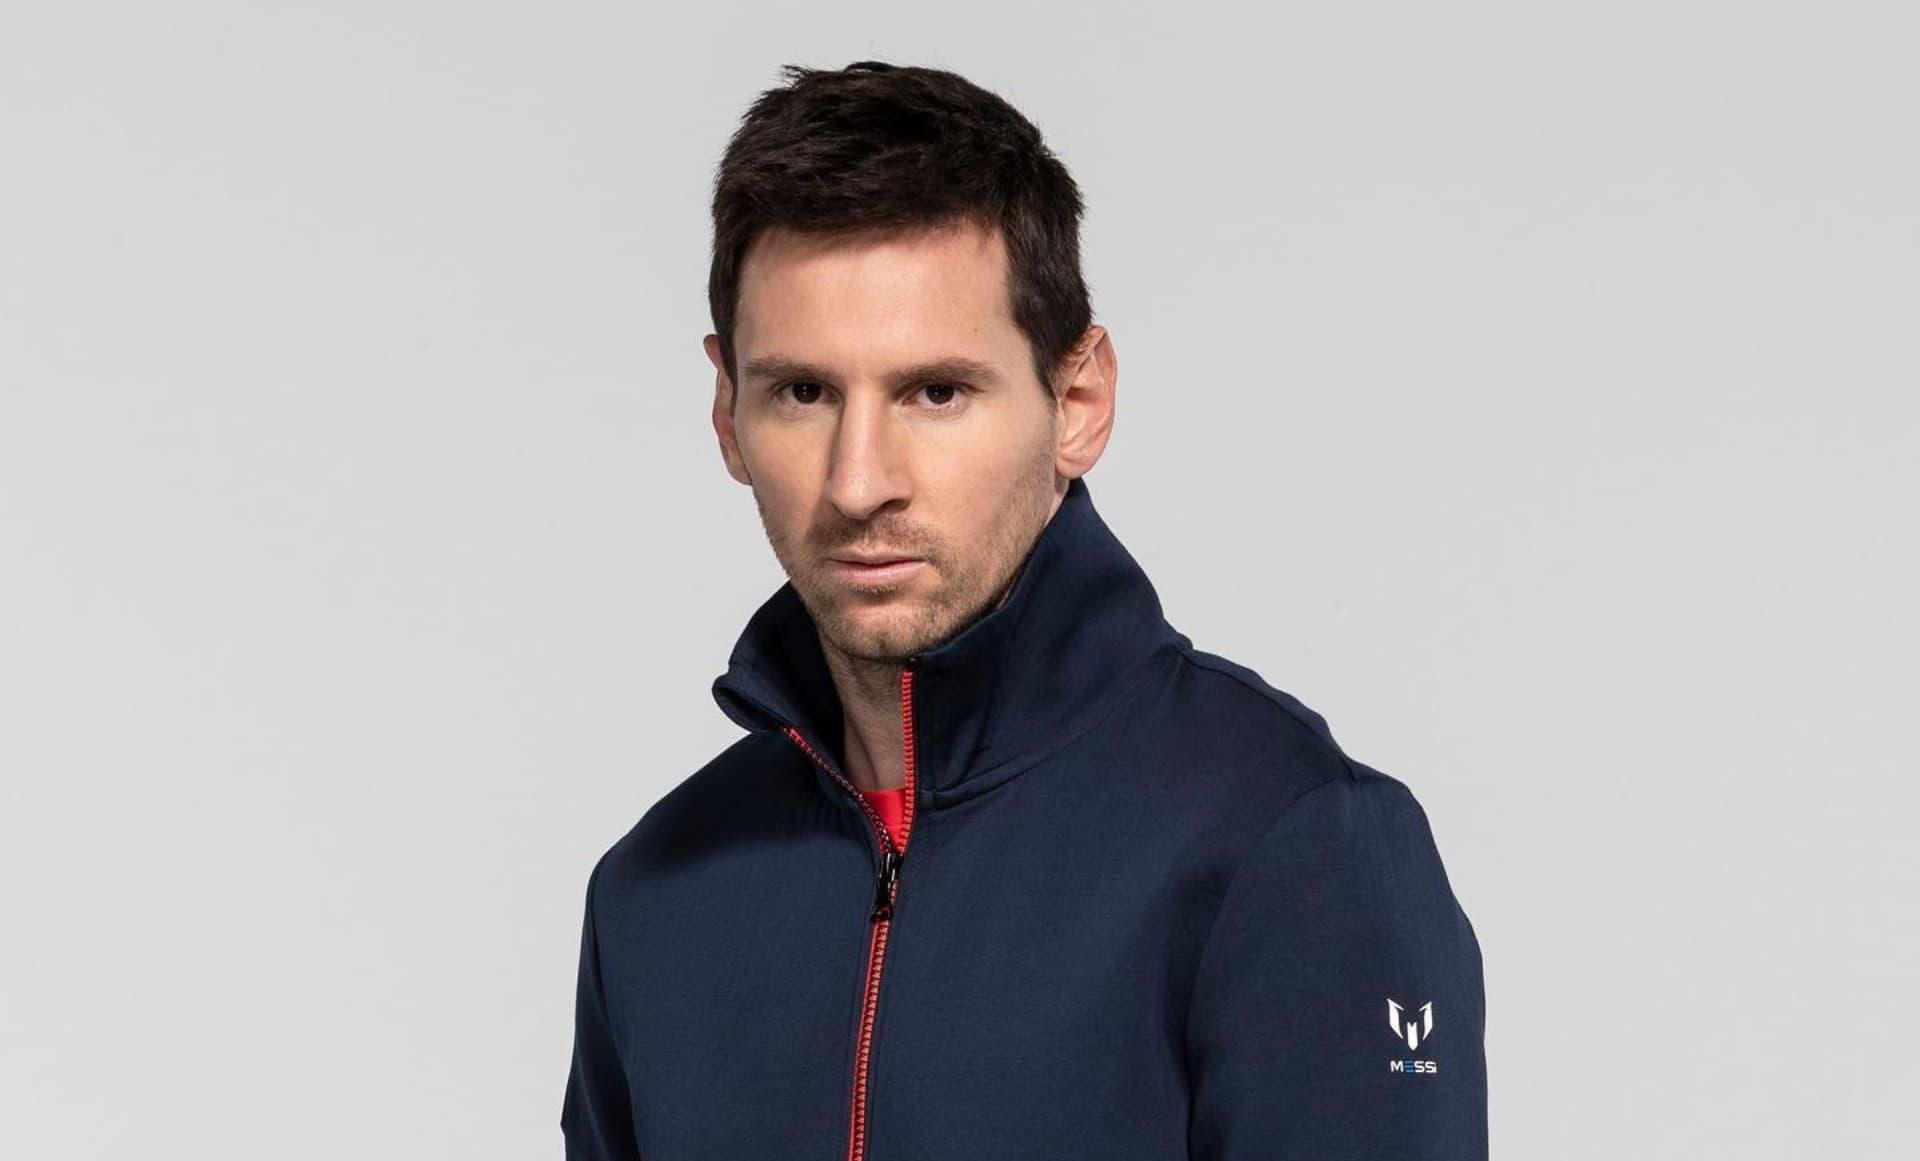 Así es The Messi Store la línea de ropa de Lionel Messi